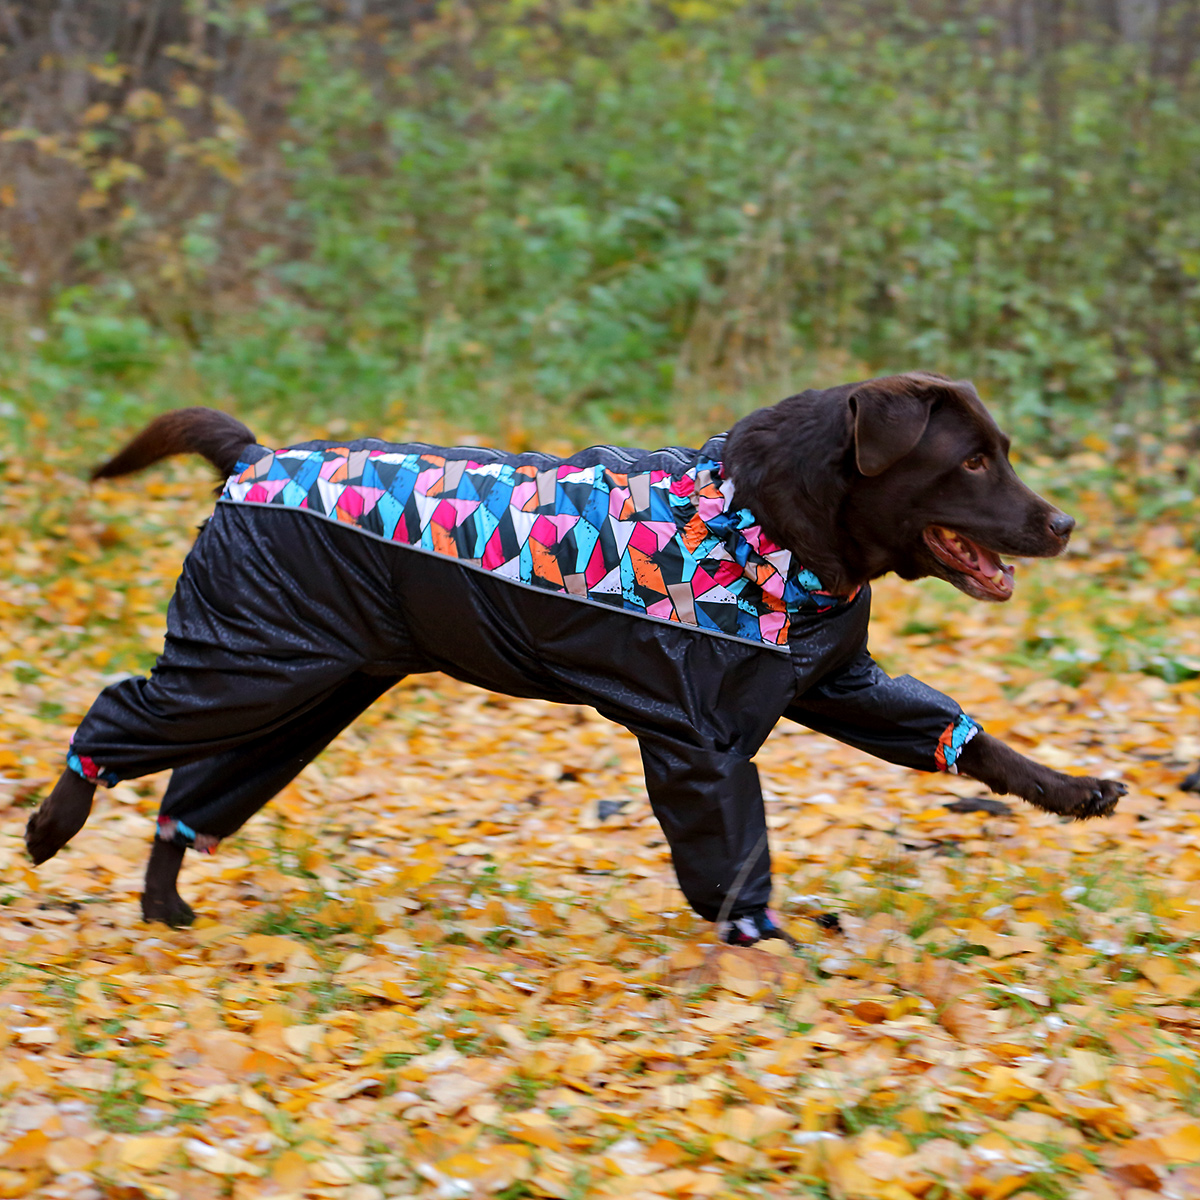 Зимний комбинезон для собак с узором